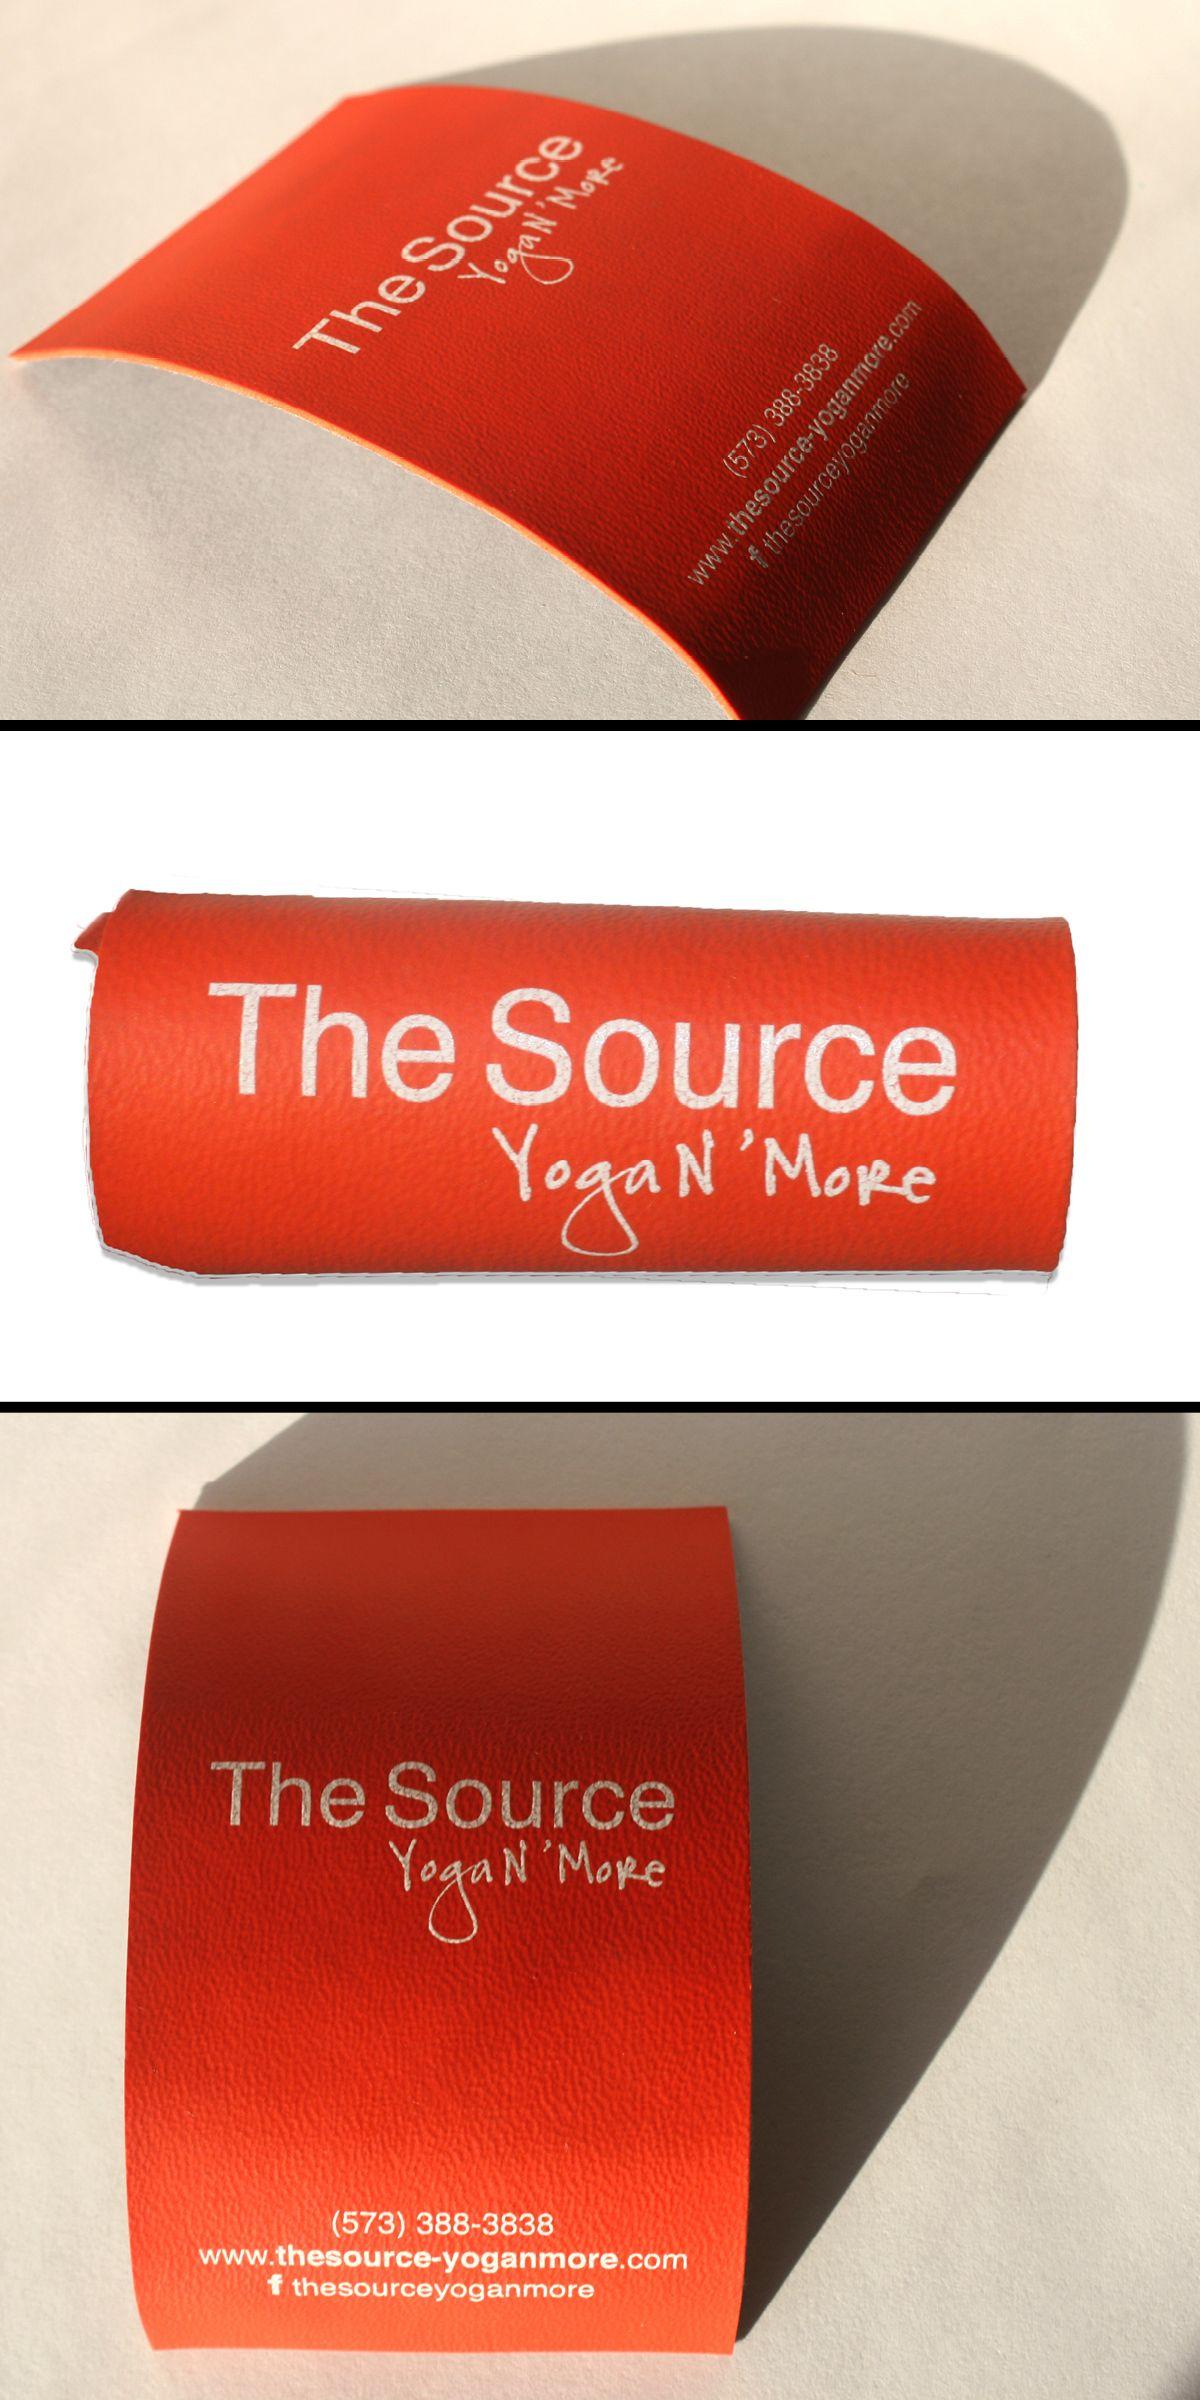 Yoga Mat Business Card   design and marketing   Pinterest ...